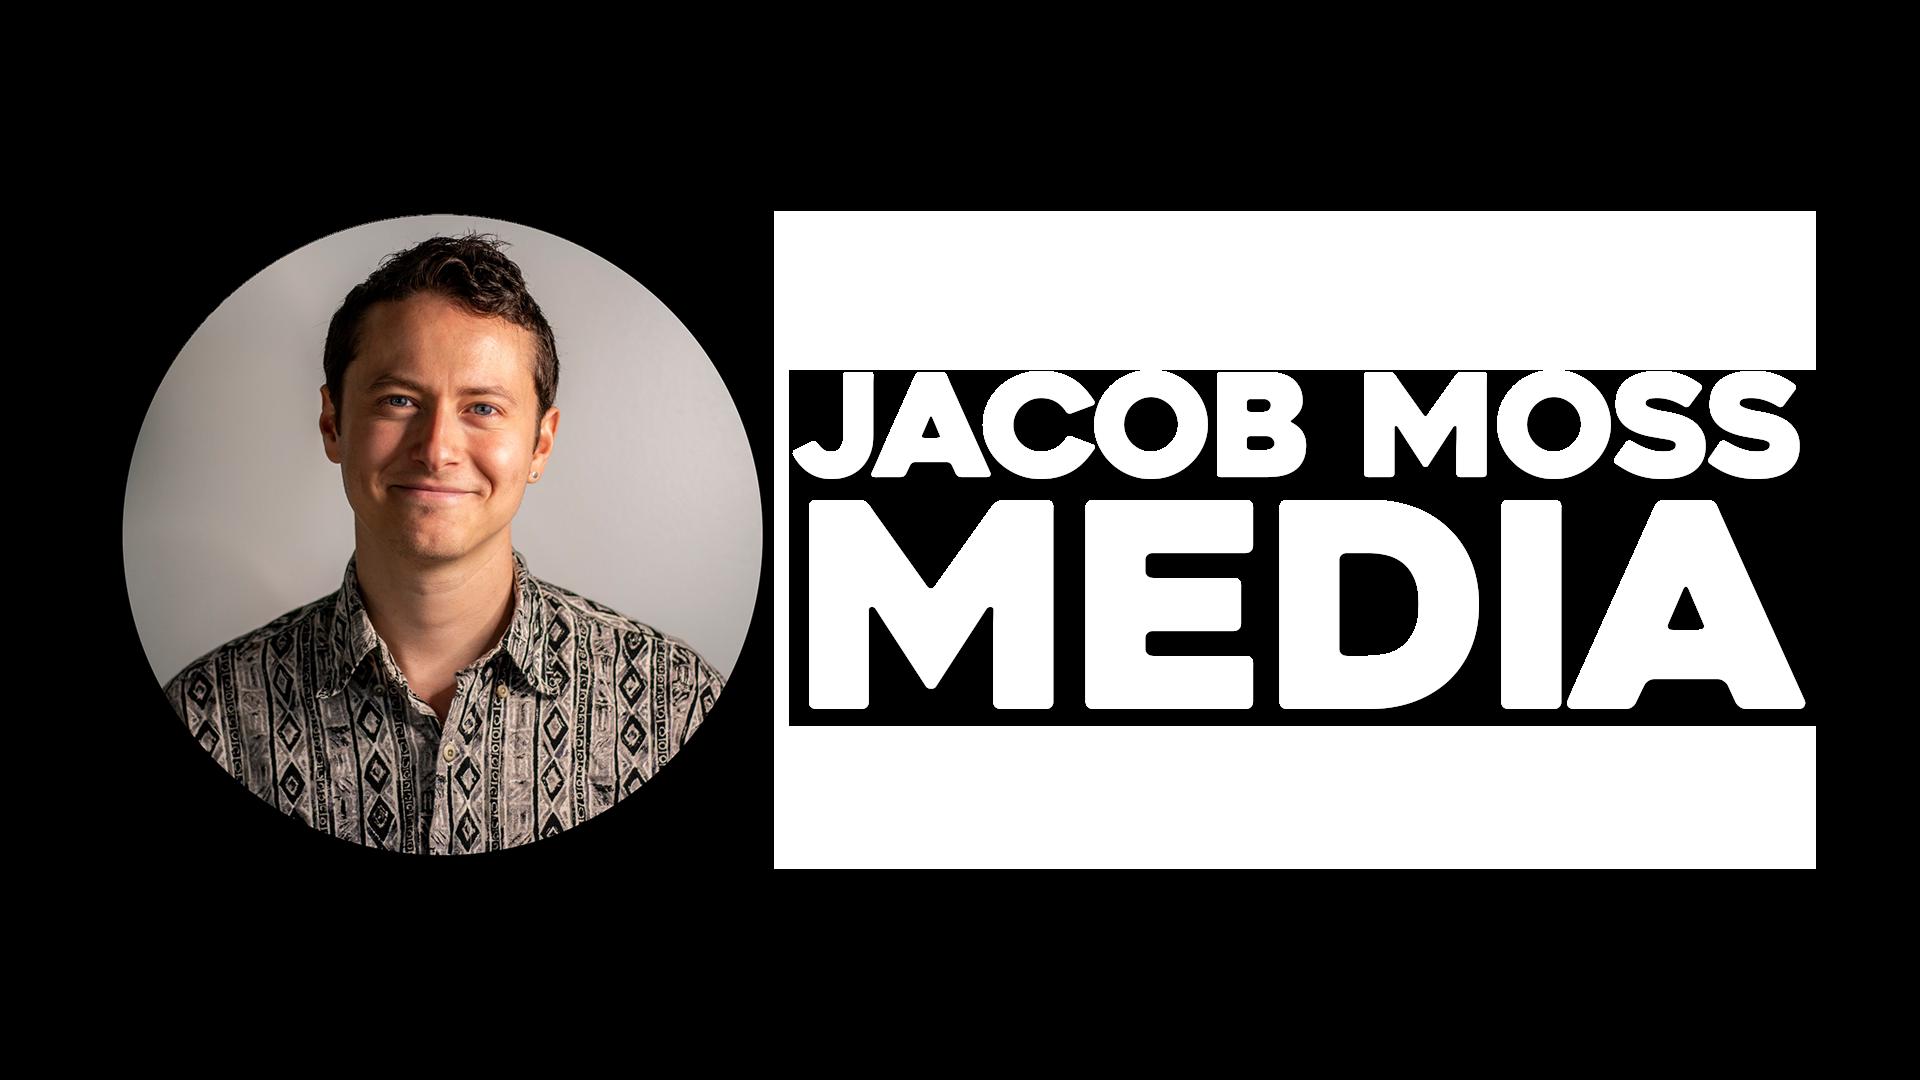 Jacob Moss Media